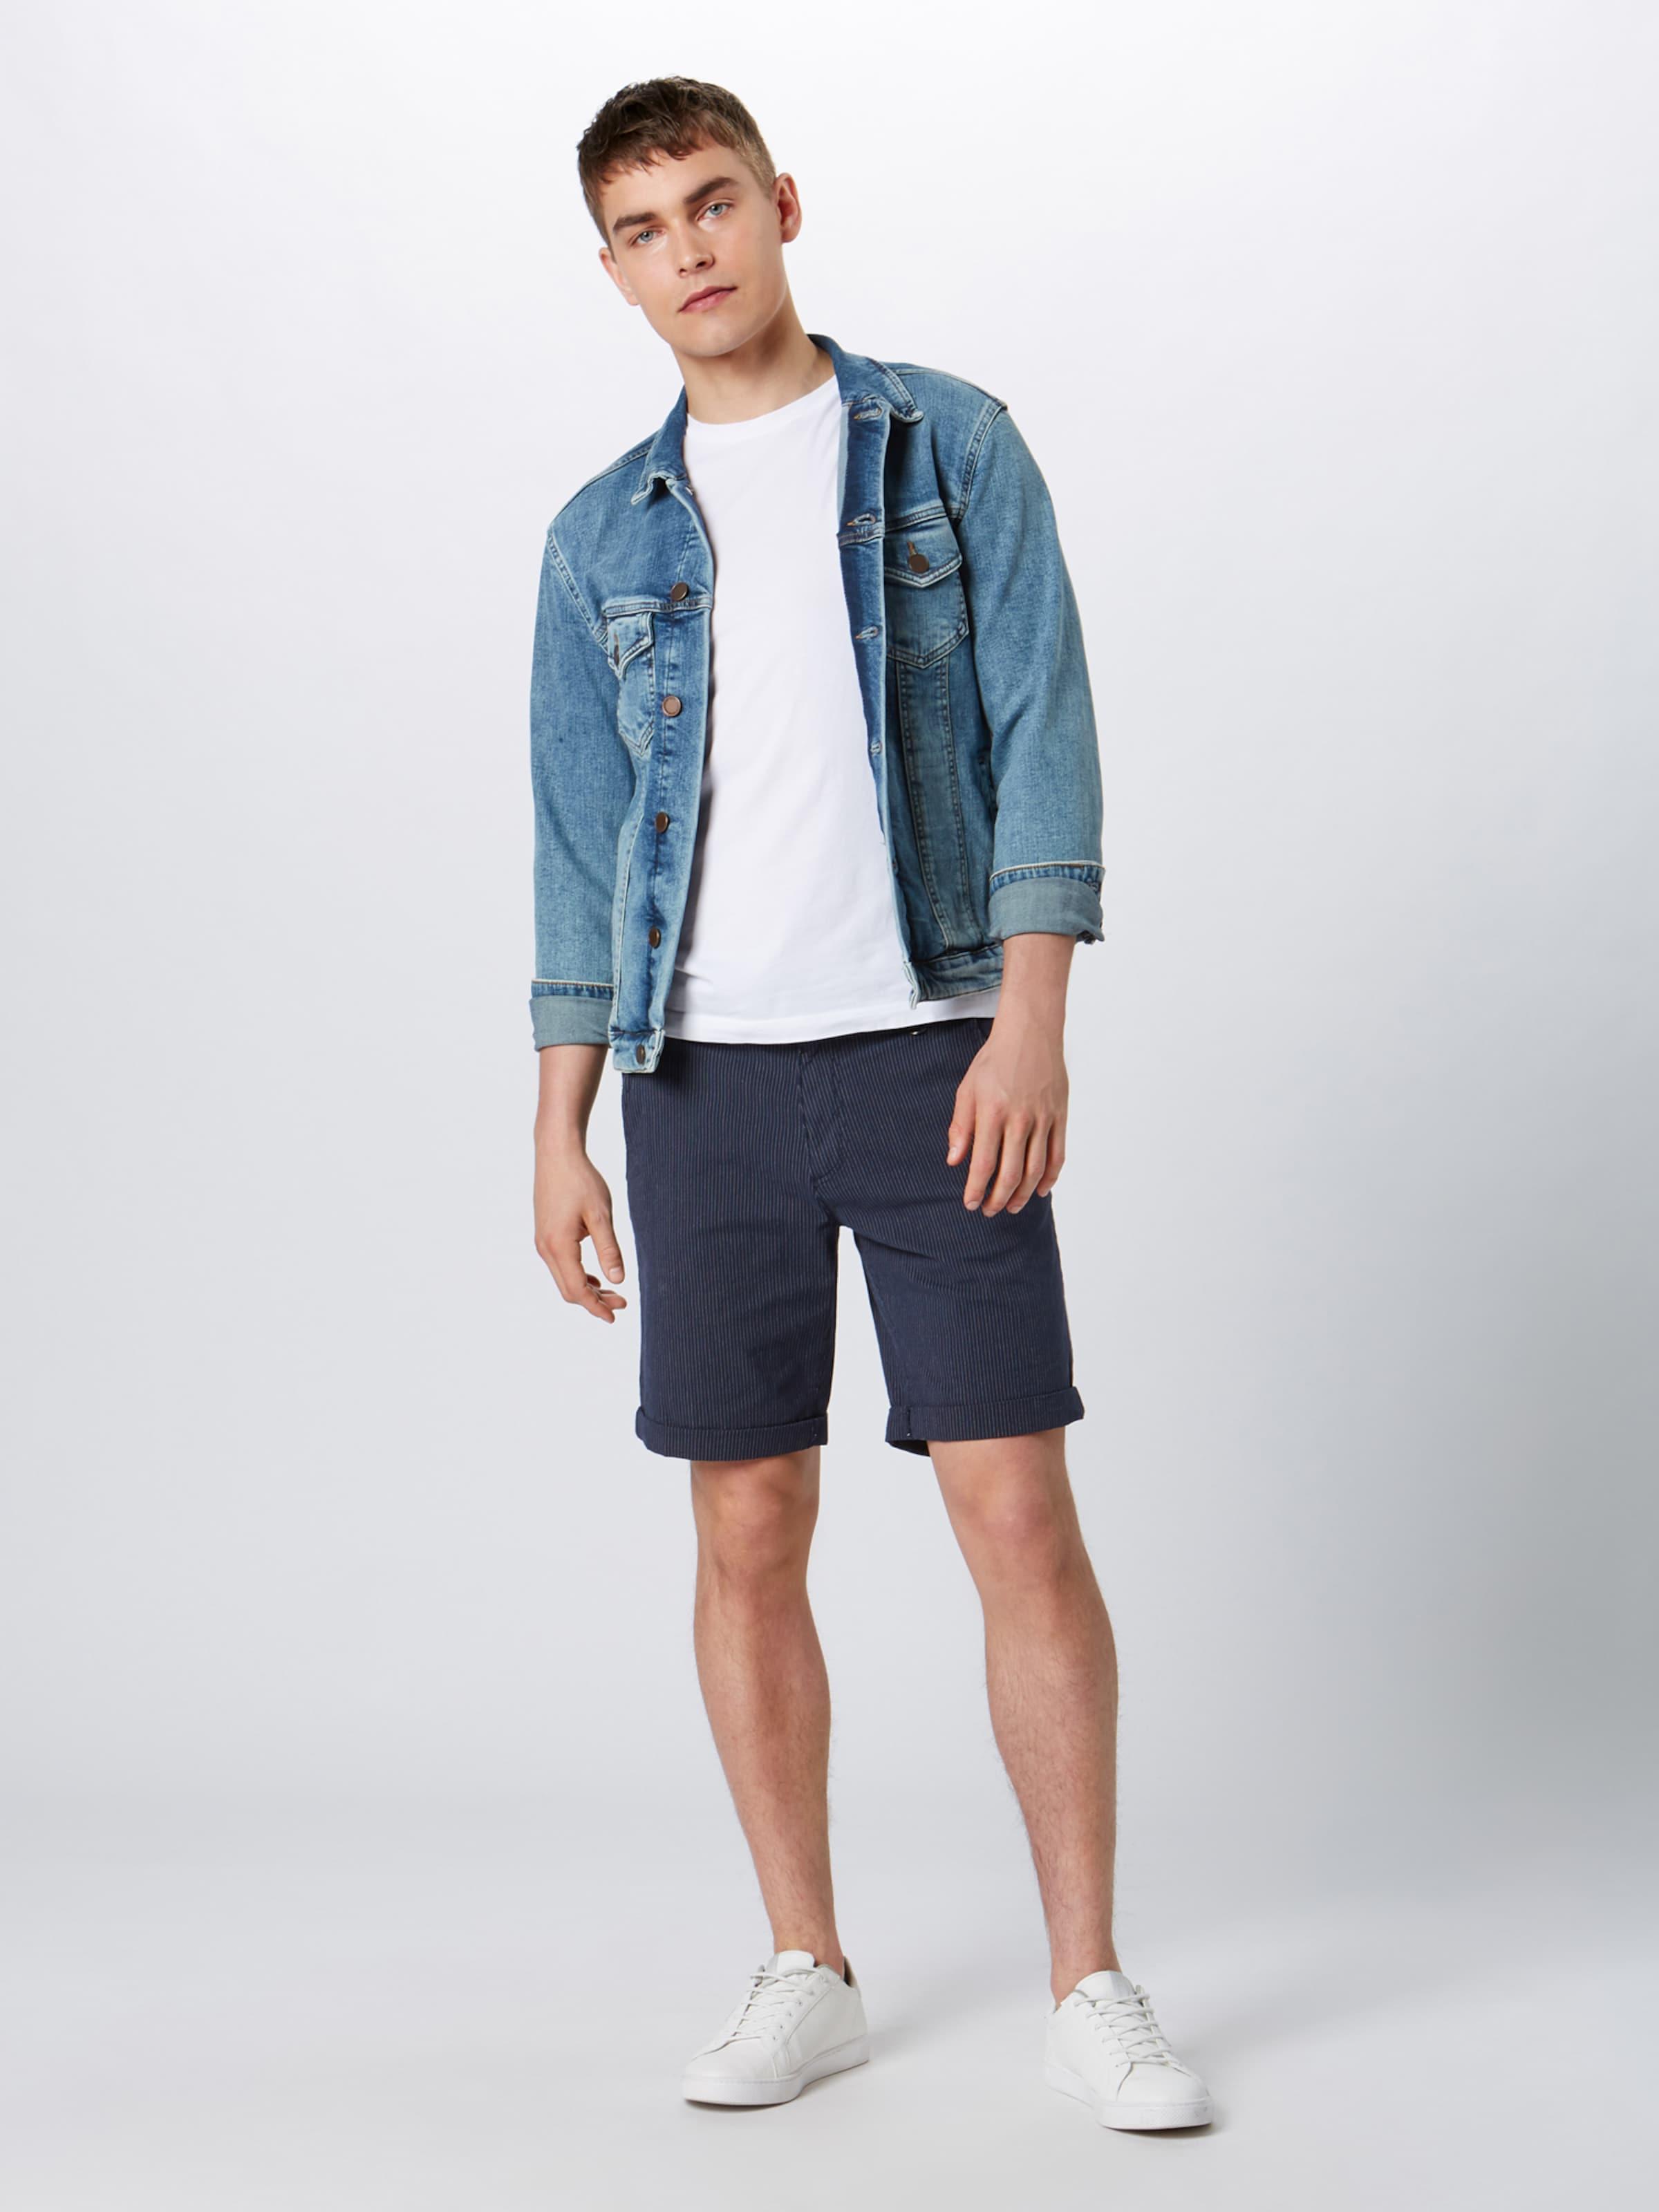 Jones Jackamp; Bleu En Chino Pantalon MarineBlanc byfgY67v